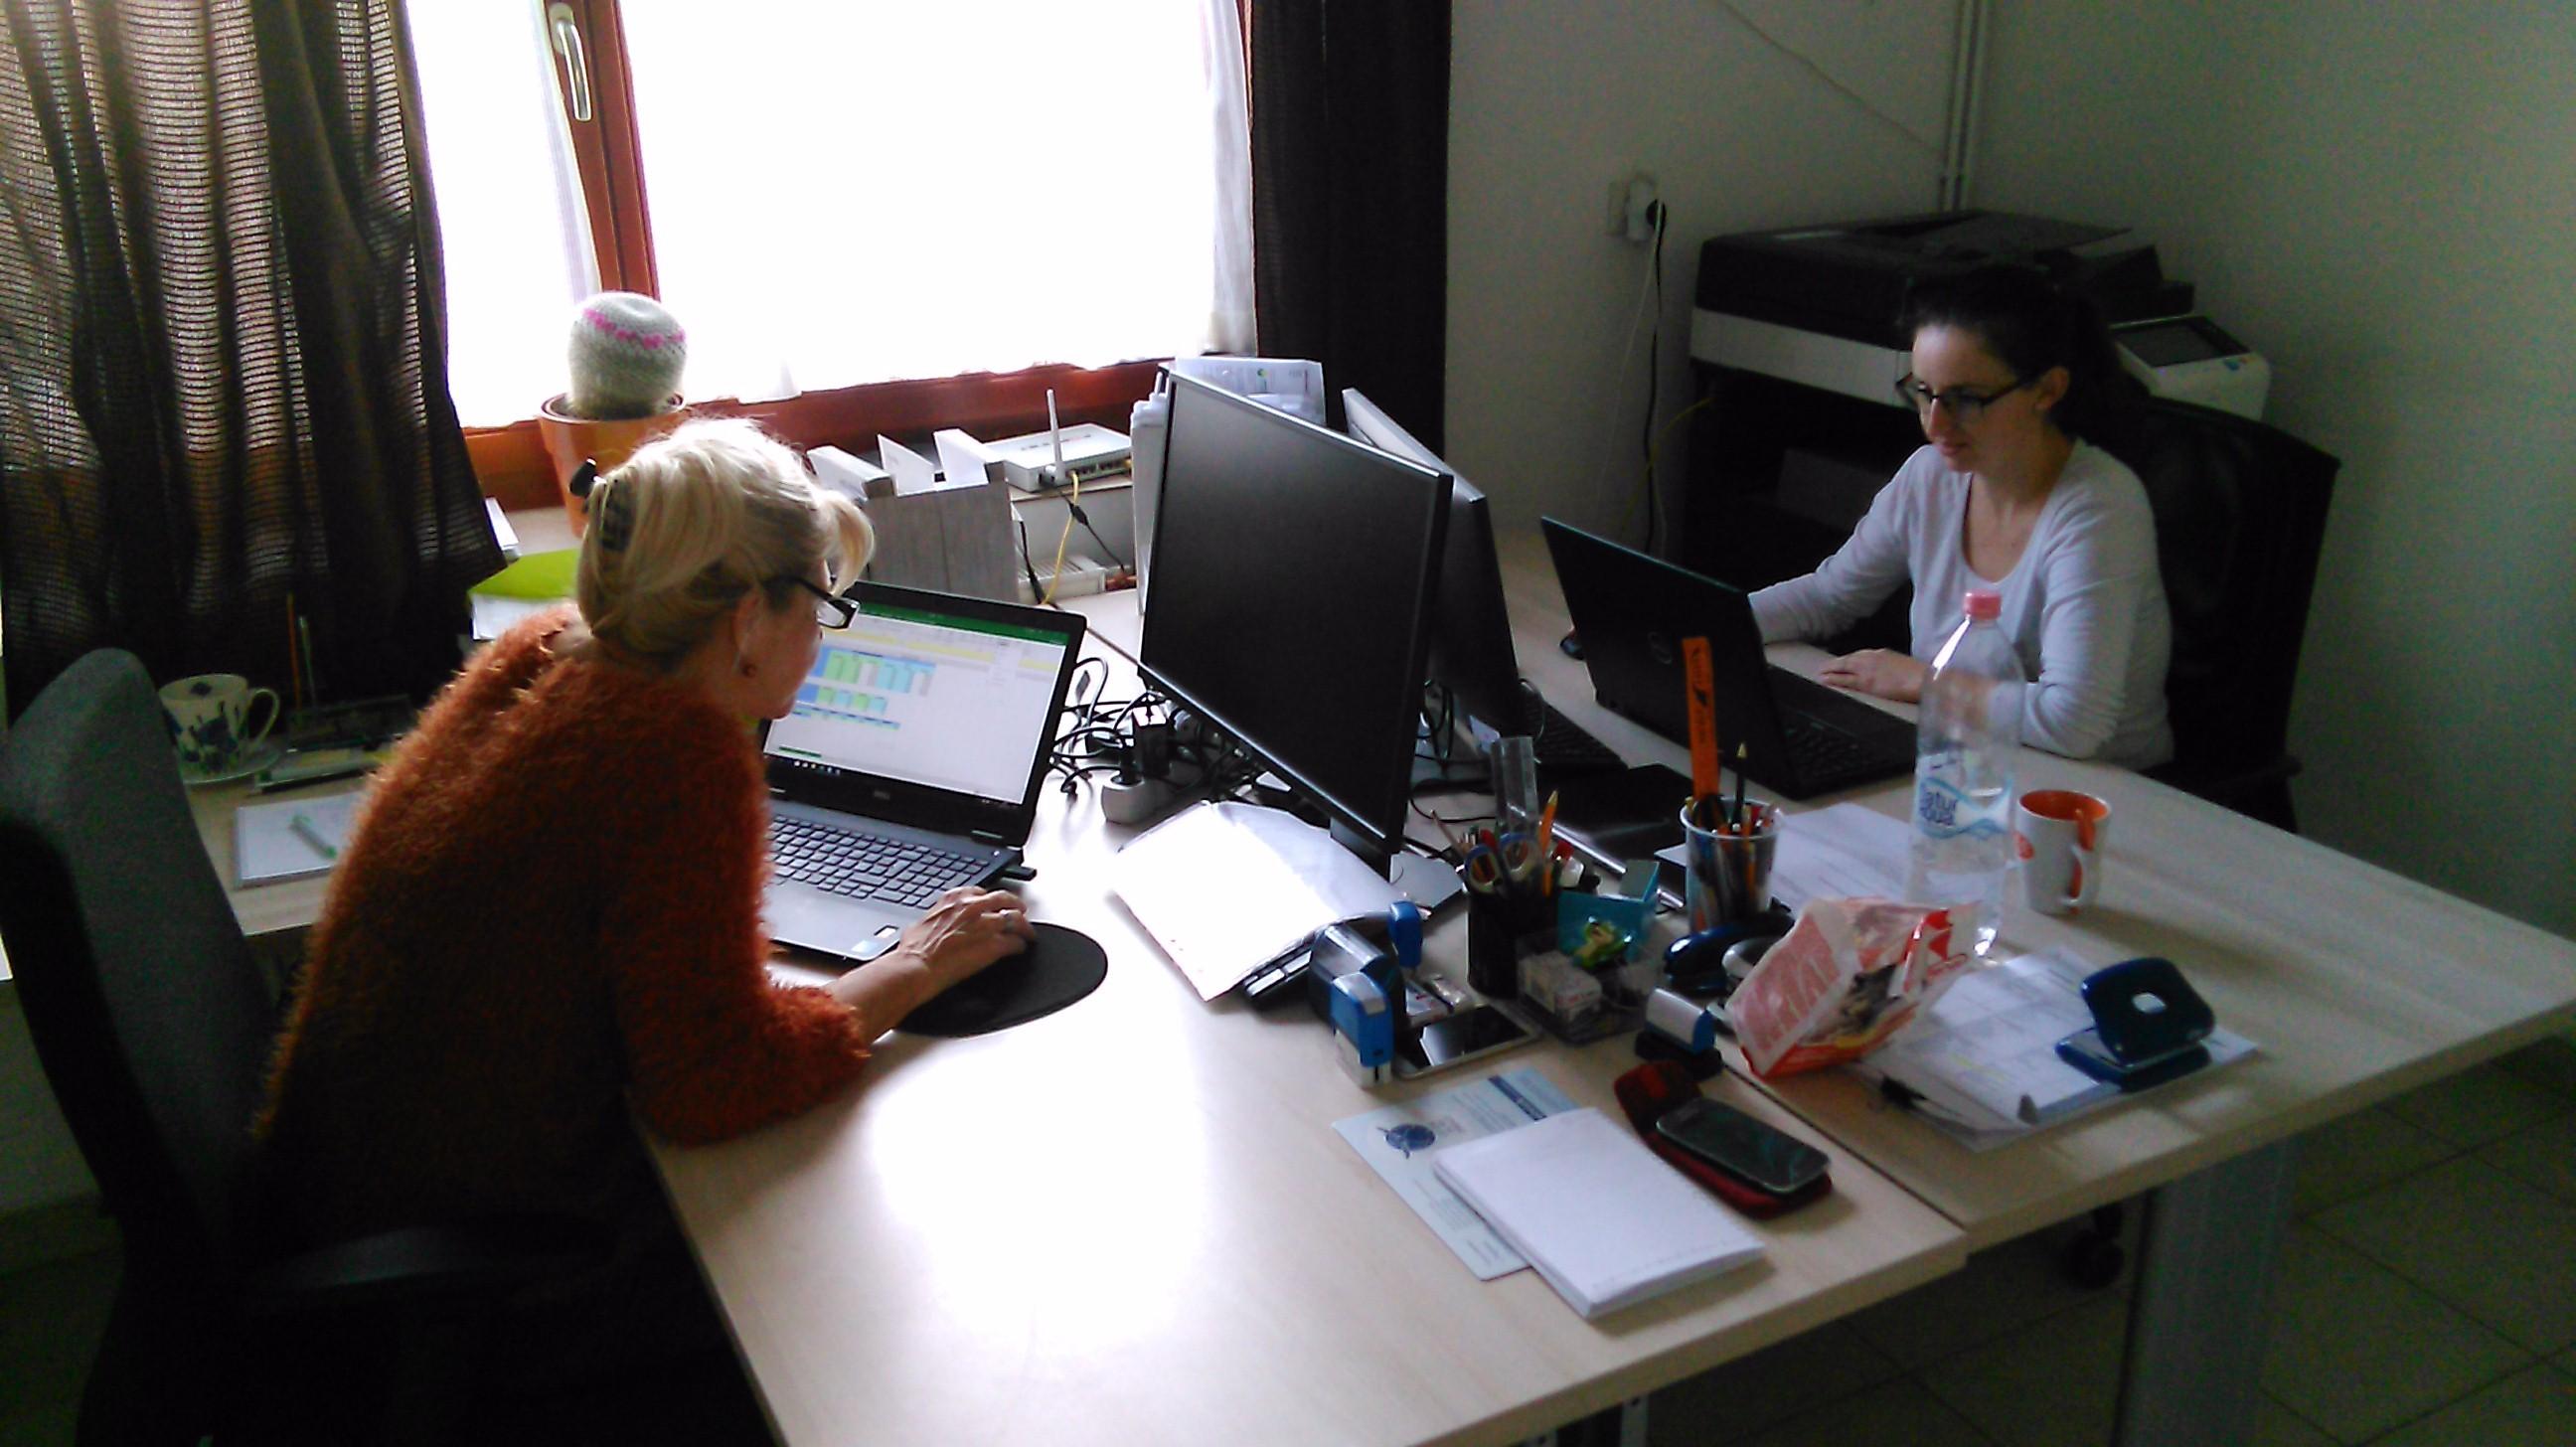 Excel tanfolyam referenciák - Envien